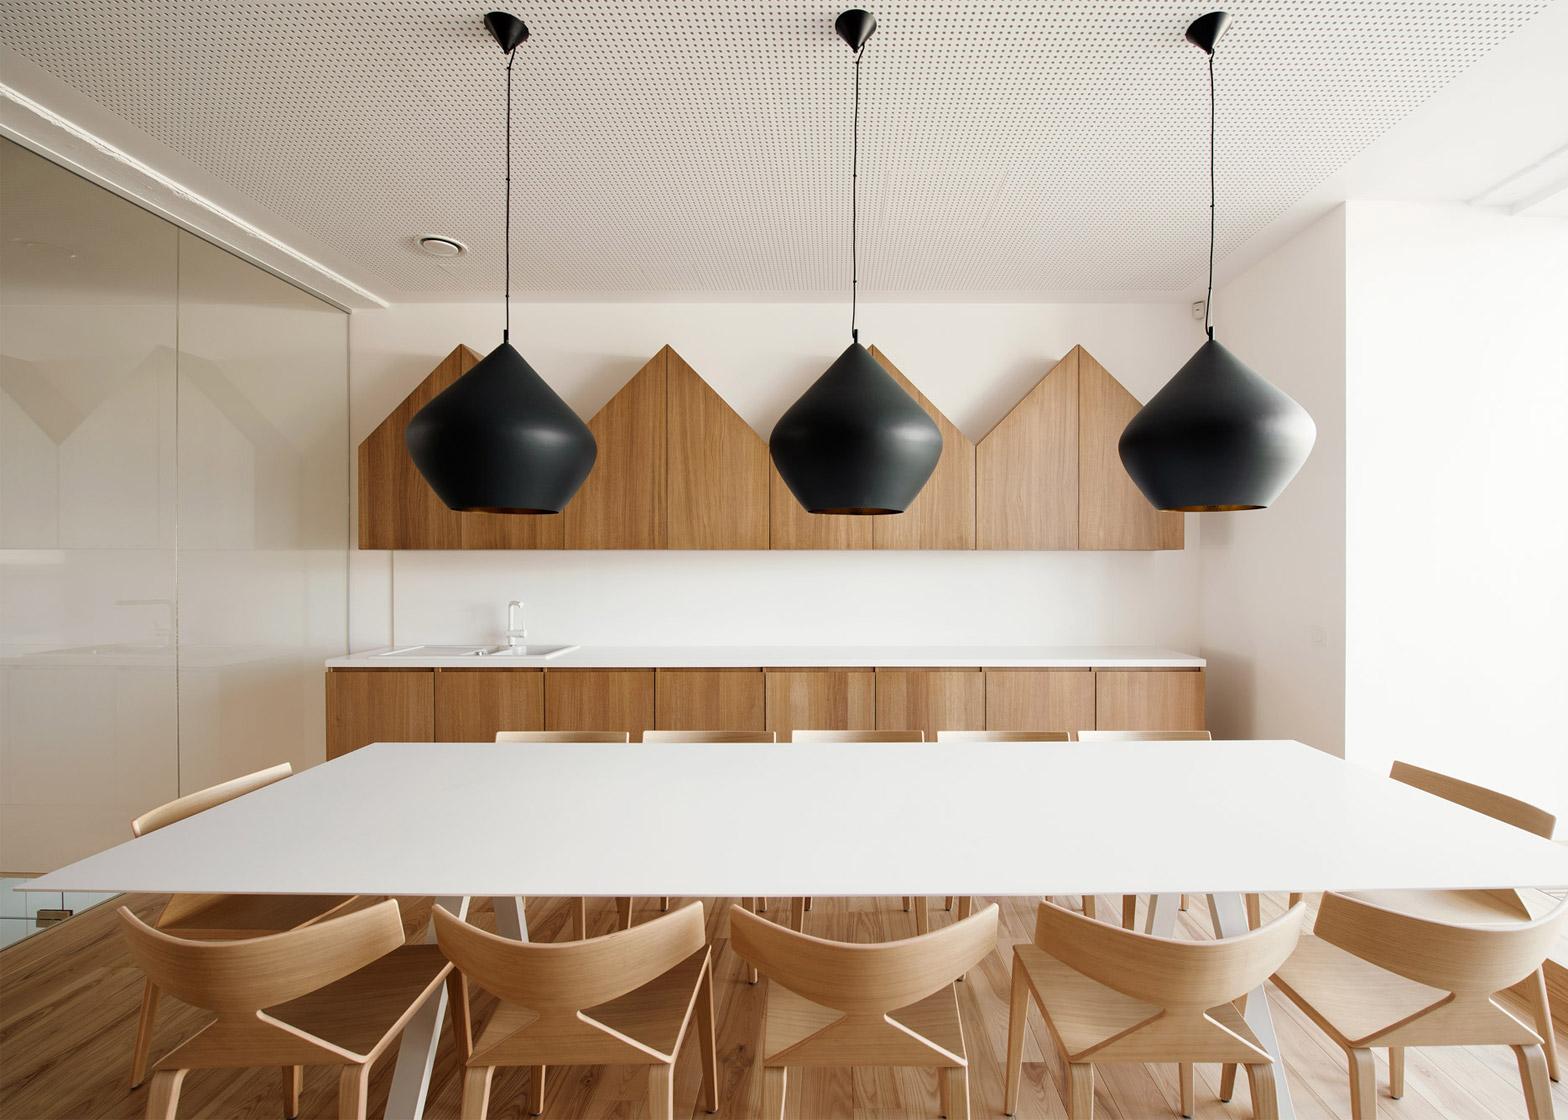 Office-Lenne_Estonia_KAMP-Arhitektid_dezeen_1568_15